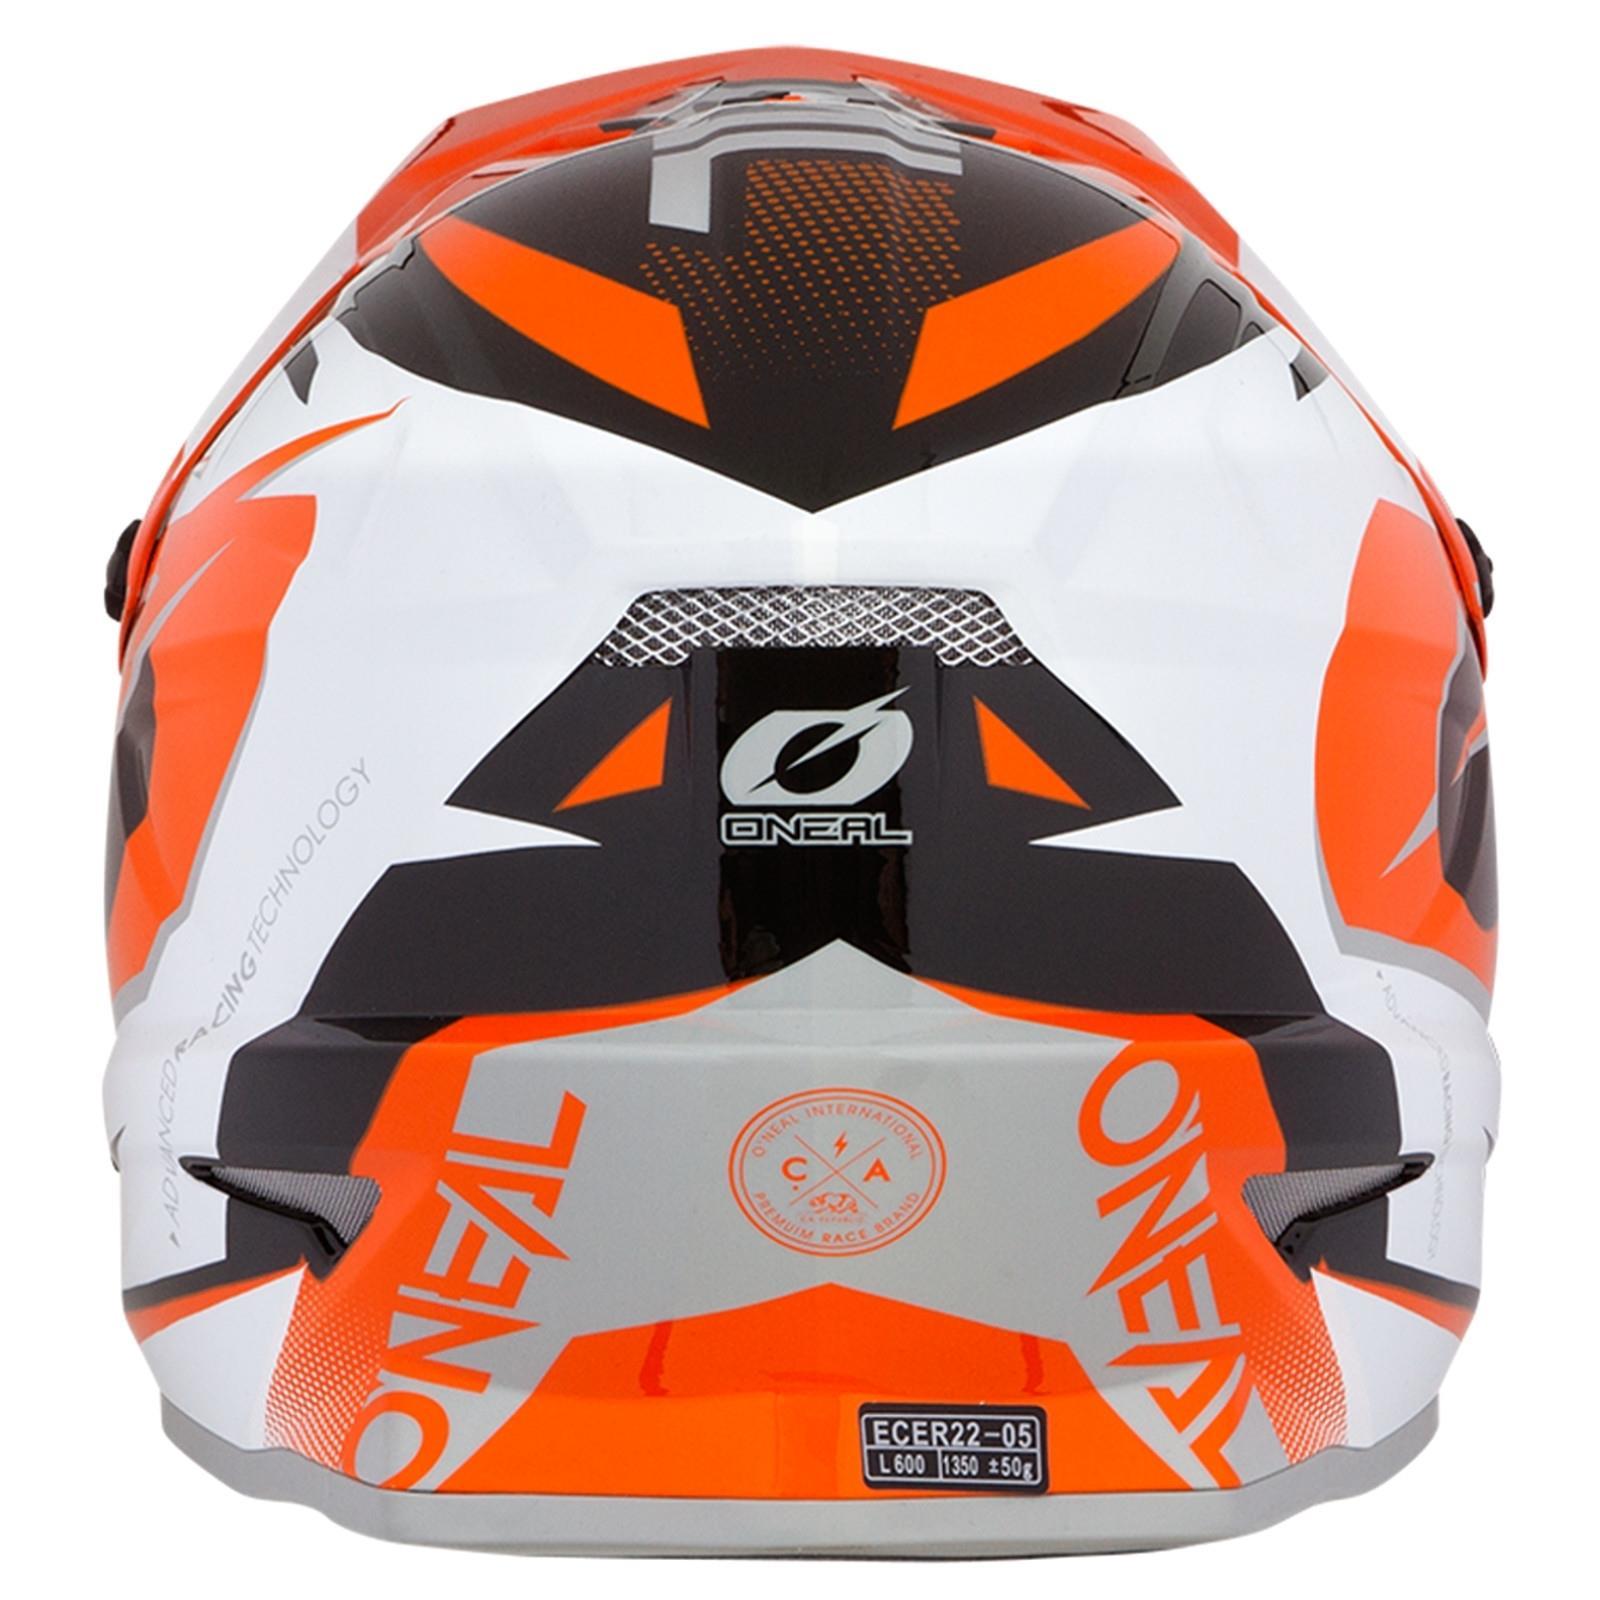 ONeal-Motocross-casco-MX-ENDURO-MOTO-BICI-FUORISTRADA-CROSS-Series-Adventure miniatura 41